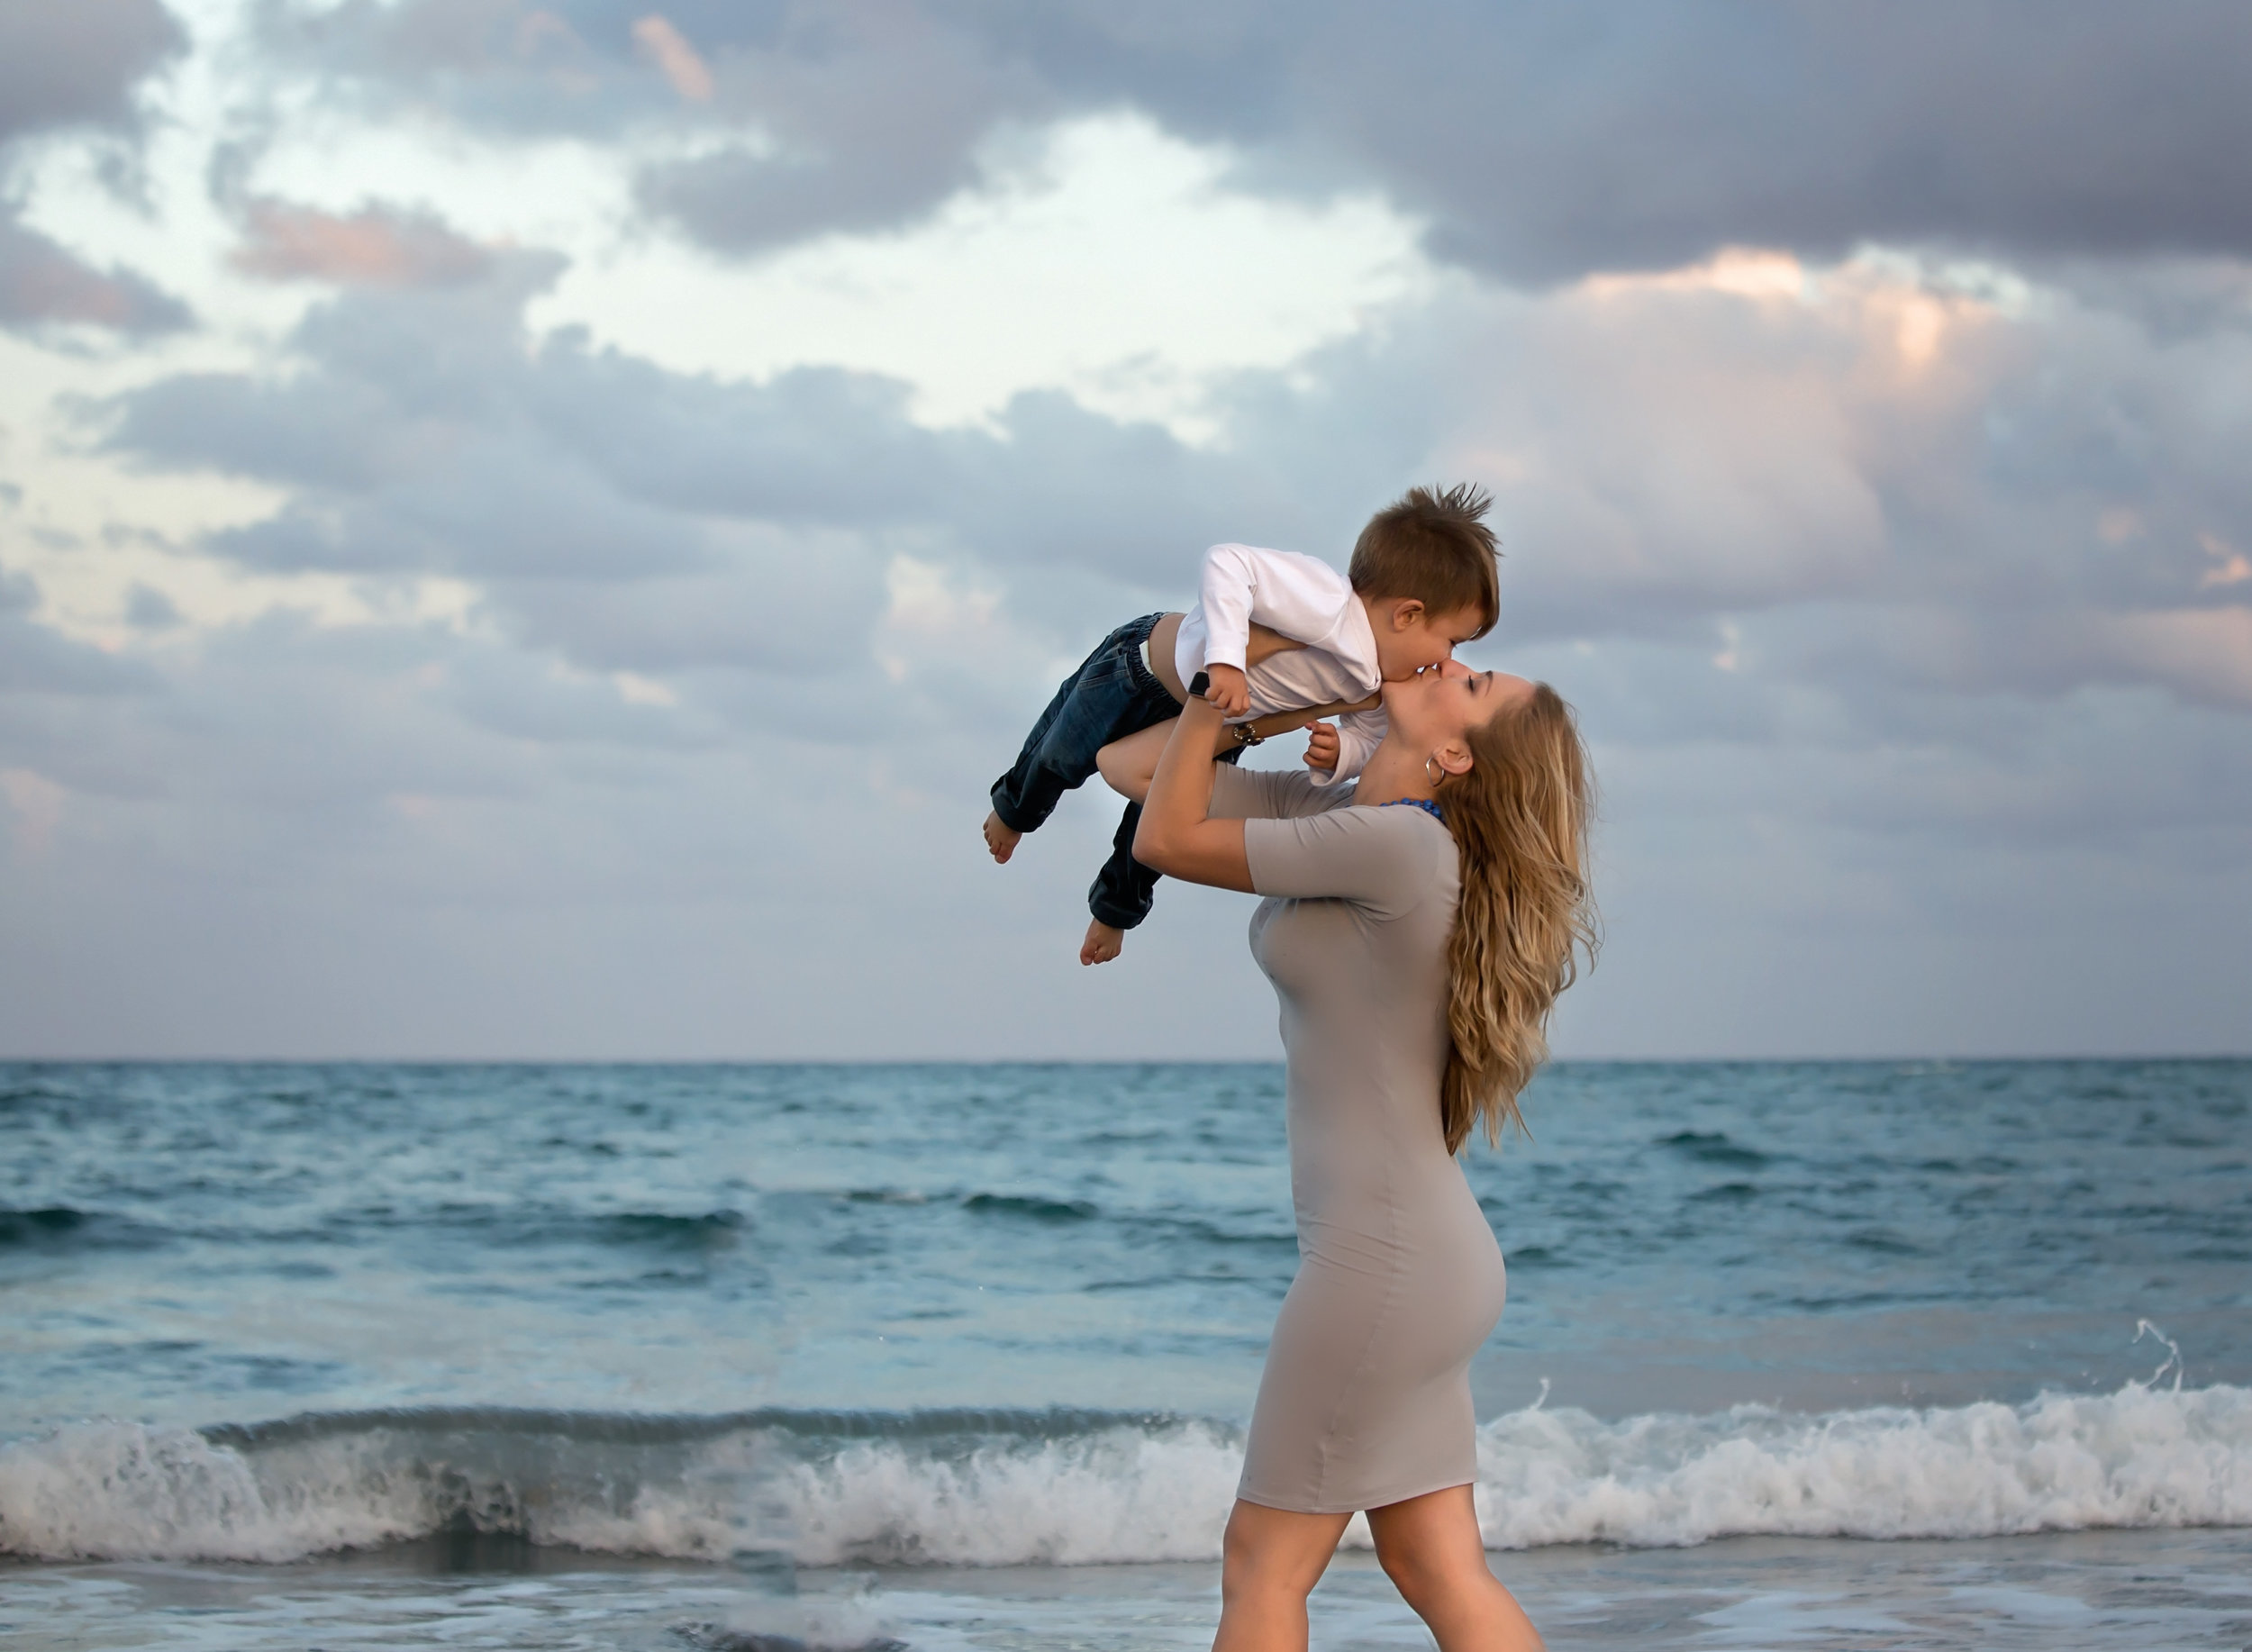 boca-raton-child-photographer-parkland-family-photographer-coral-springs-wellington-lake-worth-boynton-lantana-alissa-delucca-photography-mom-holding-son-on-beach.jpg